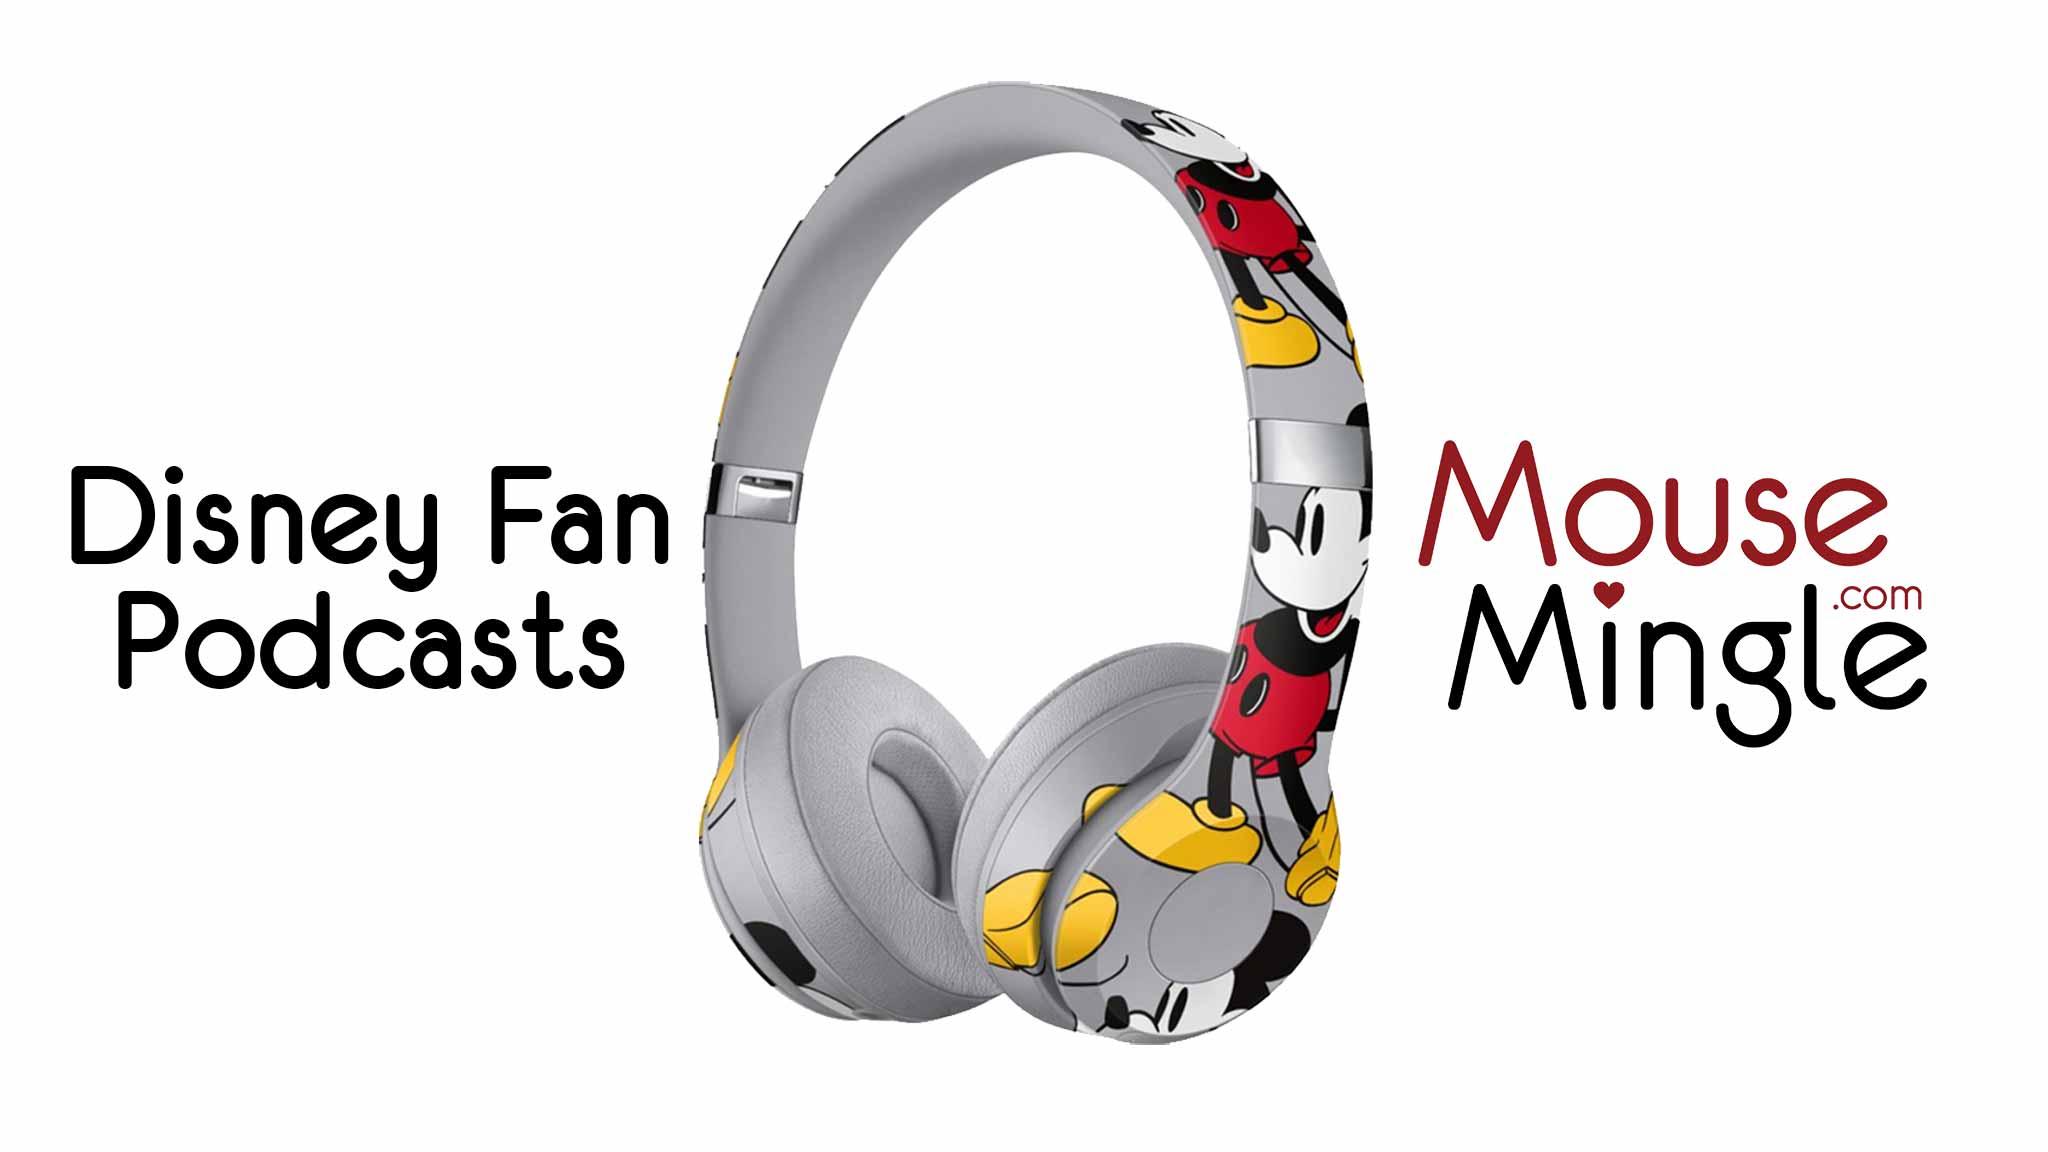 Disney Fan Podcasts